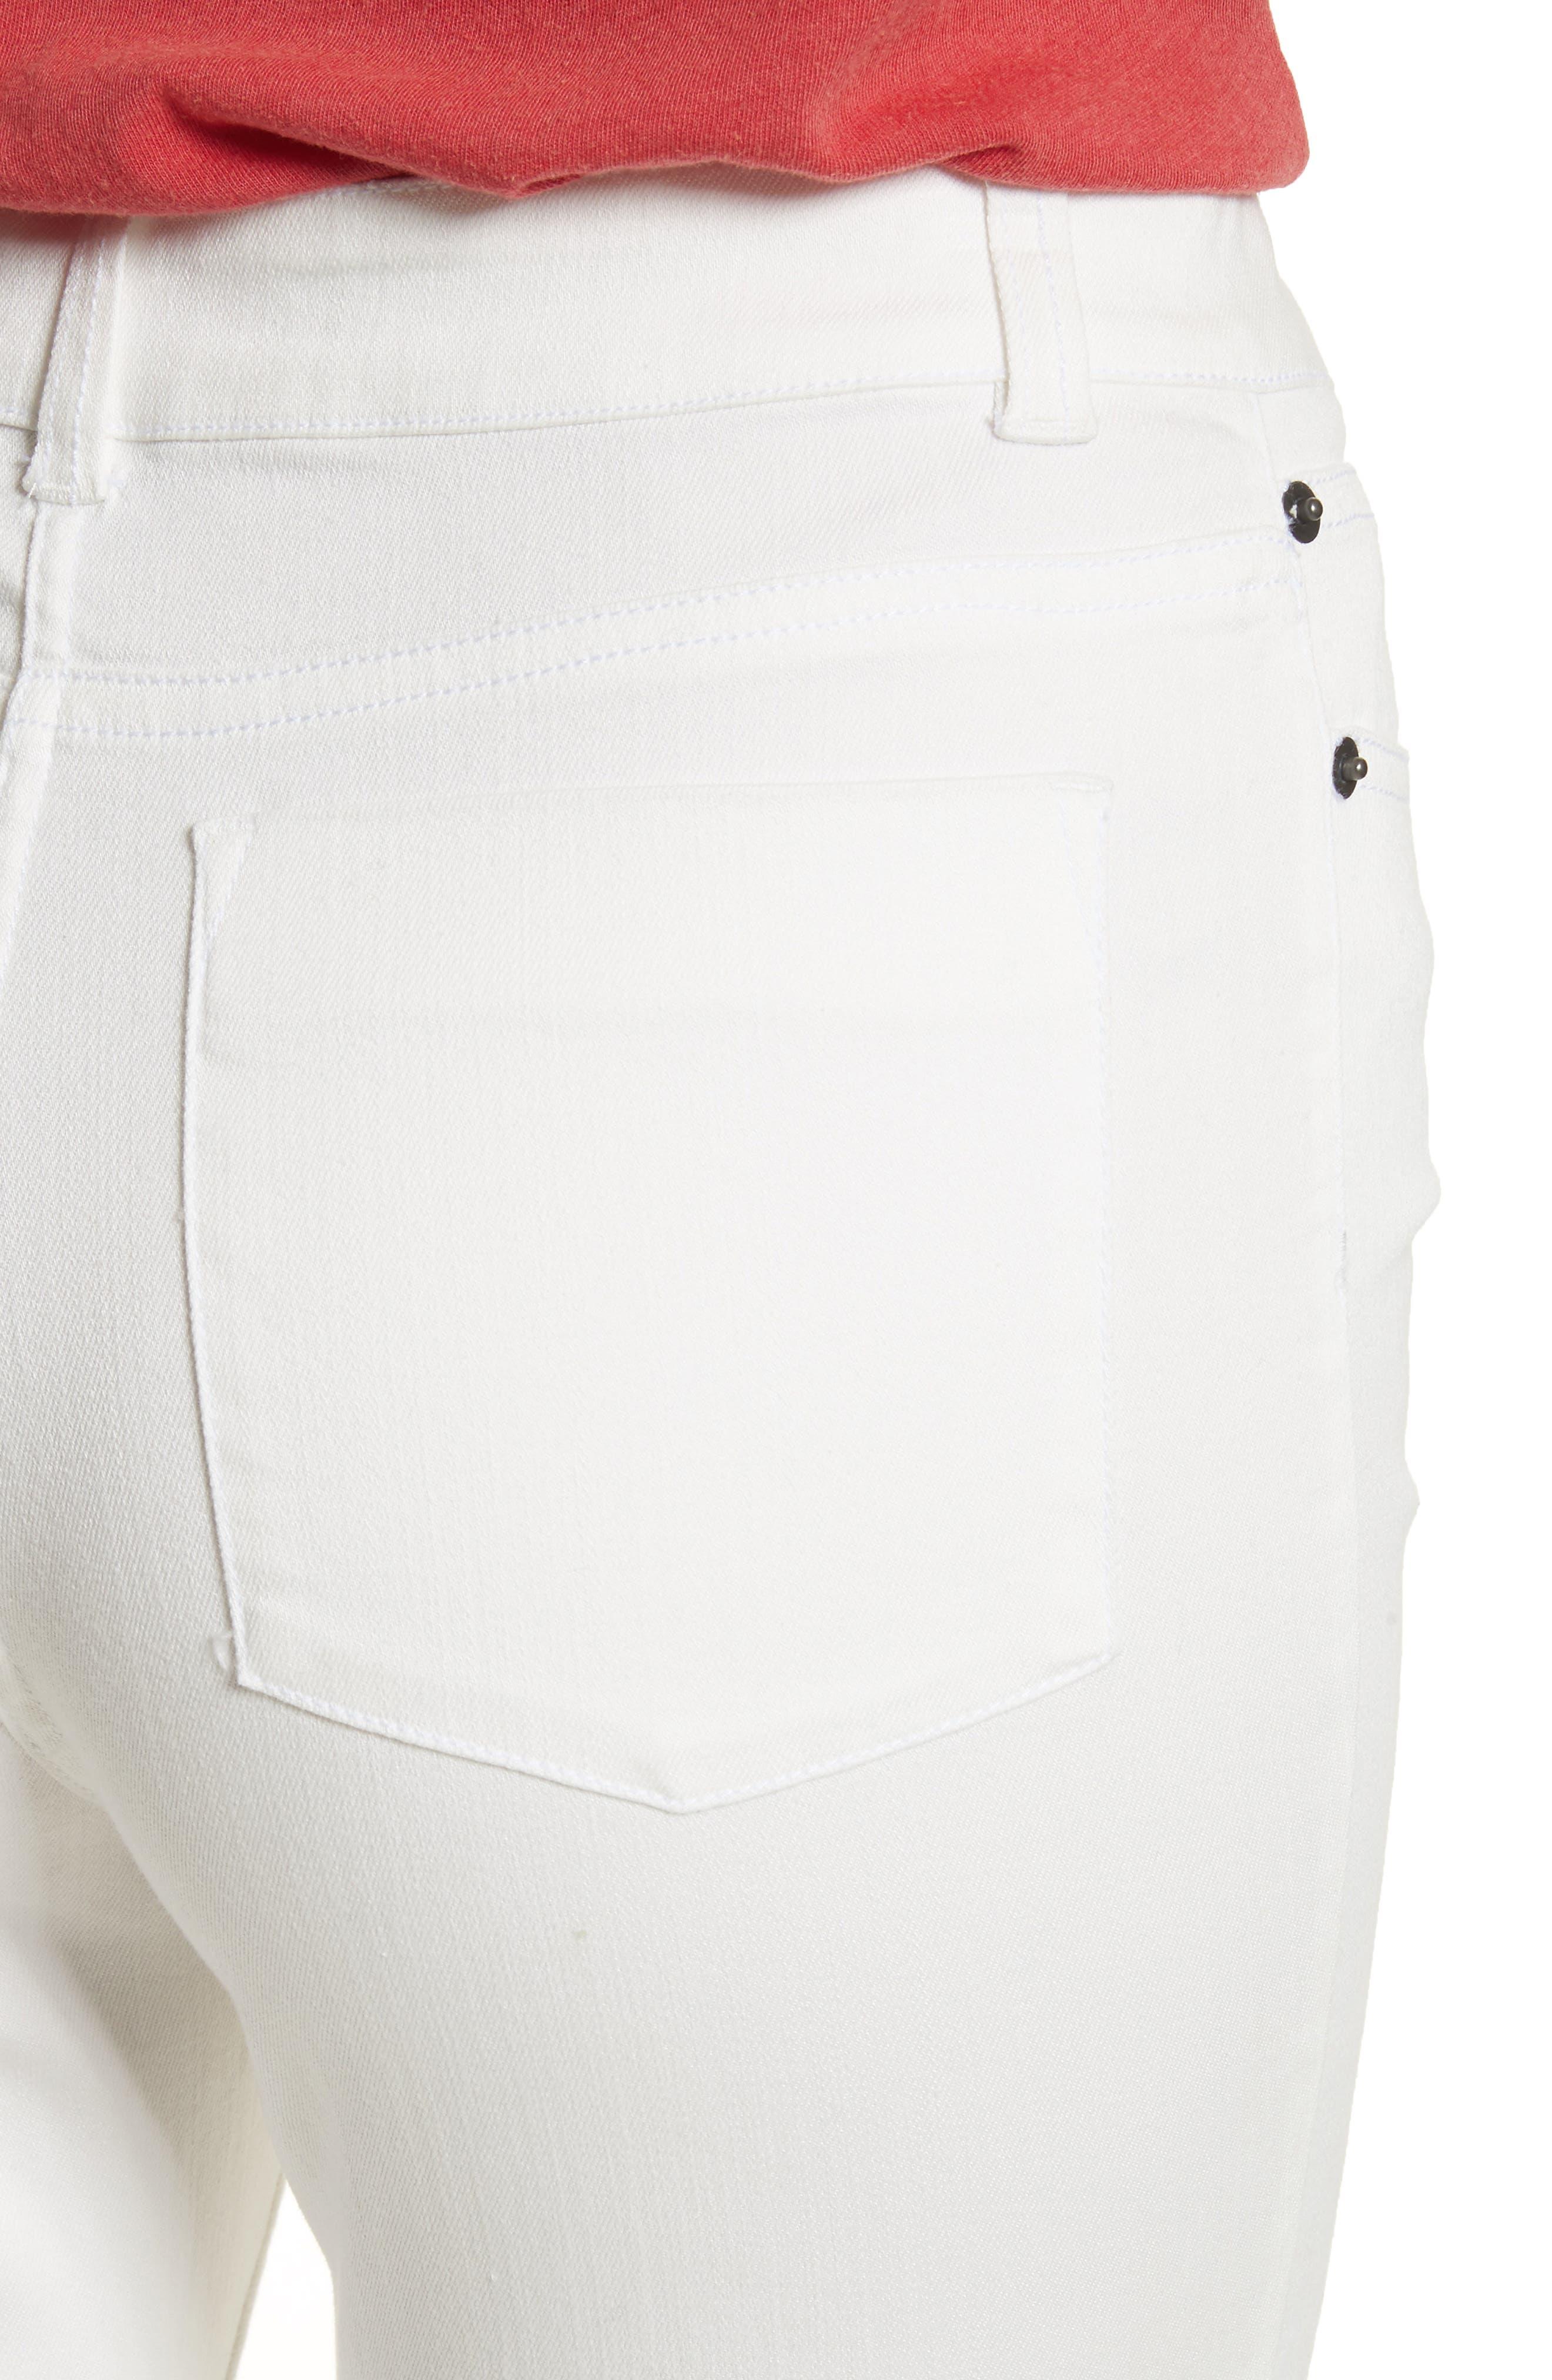 AO.LA Zoe Ruffle Hem Crop Jeans,                             Alternate thumbnail 4, color,                             White